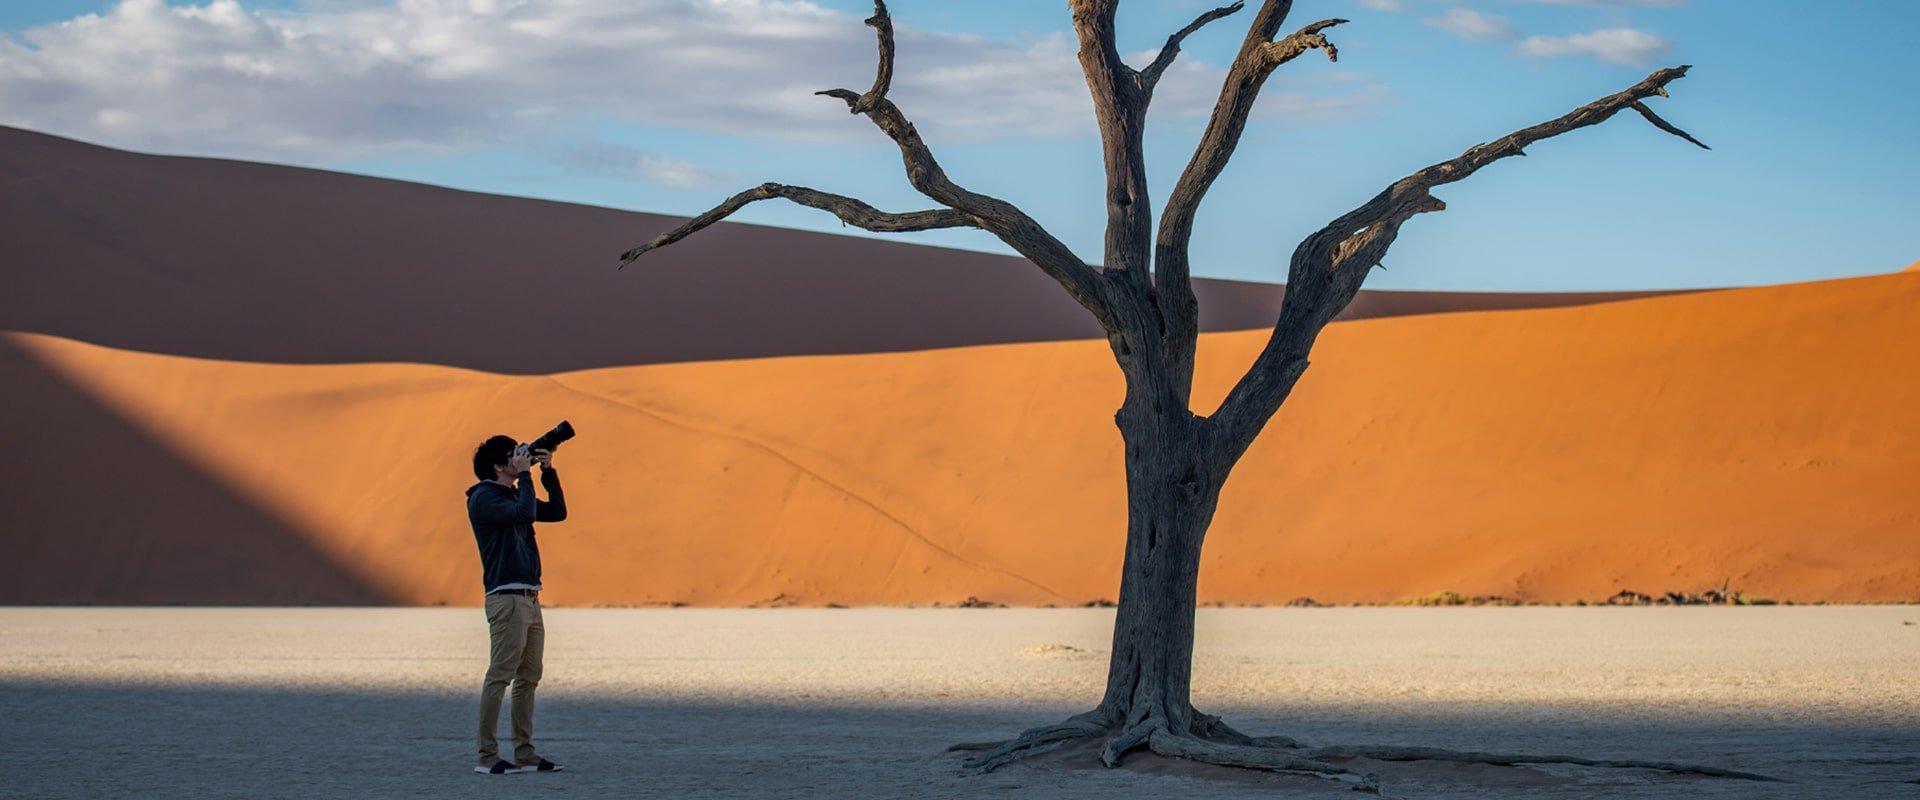 Amazing photographic opportunities in Deadvlei